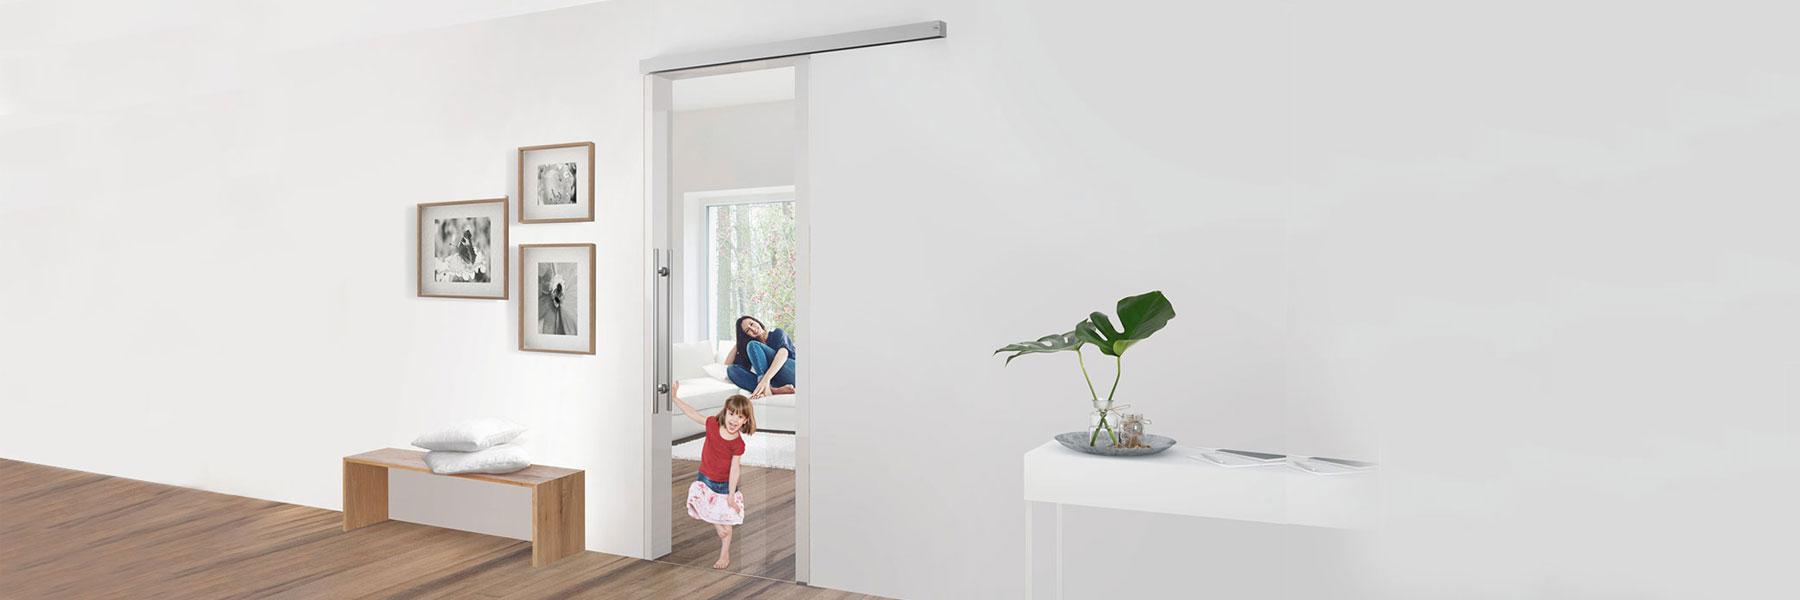 Slider Dormakaba Muto Comfort M60 Schiebetür Ganzglasschieben Glasschiebetür Glasanlagen Dorma